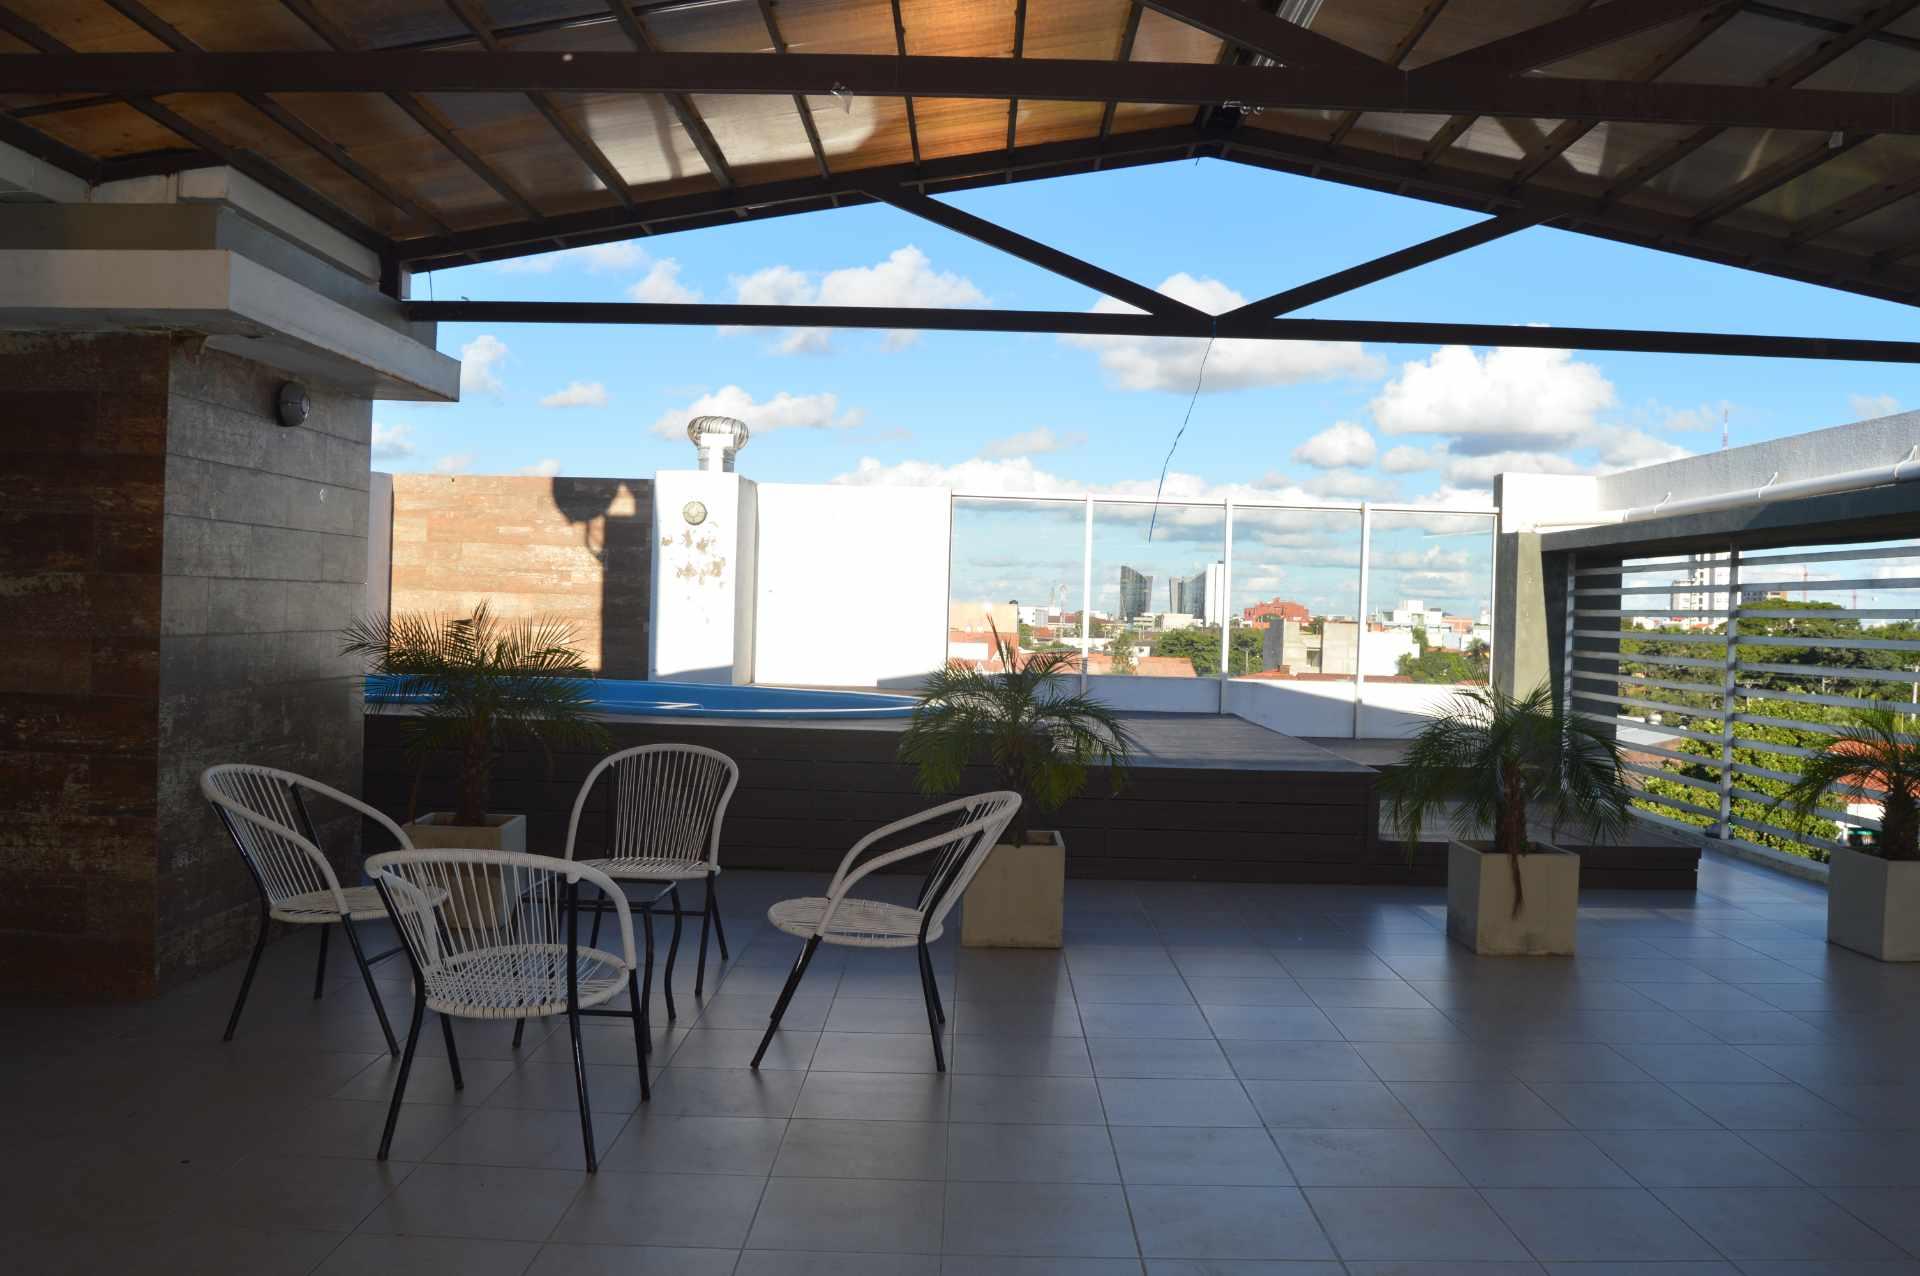 Departamento en Alquiler Zona Norte, 3er Anillo Externo, Radial 27, Condominio Portofino III, Piso 2. A menos de 3 minutos de zona empresarial de Equipetrol y Mall Ventura. Foto 14